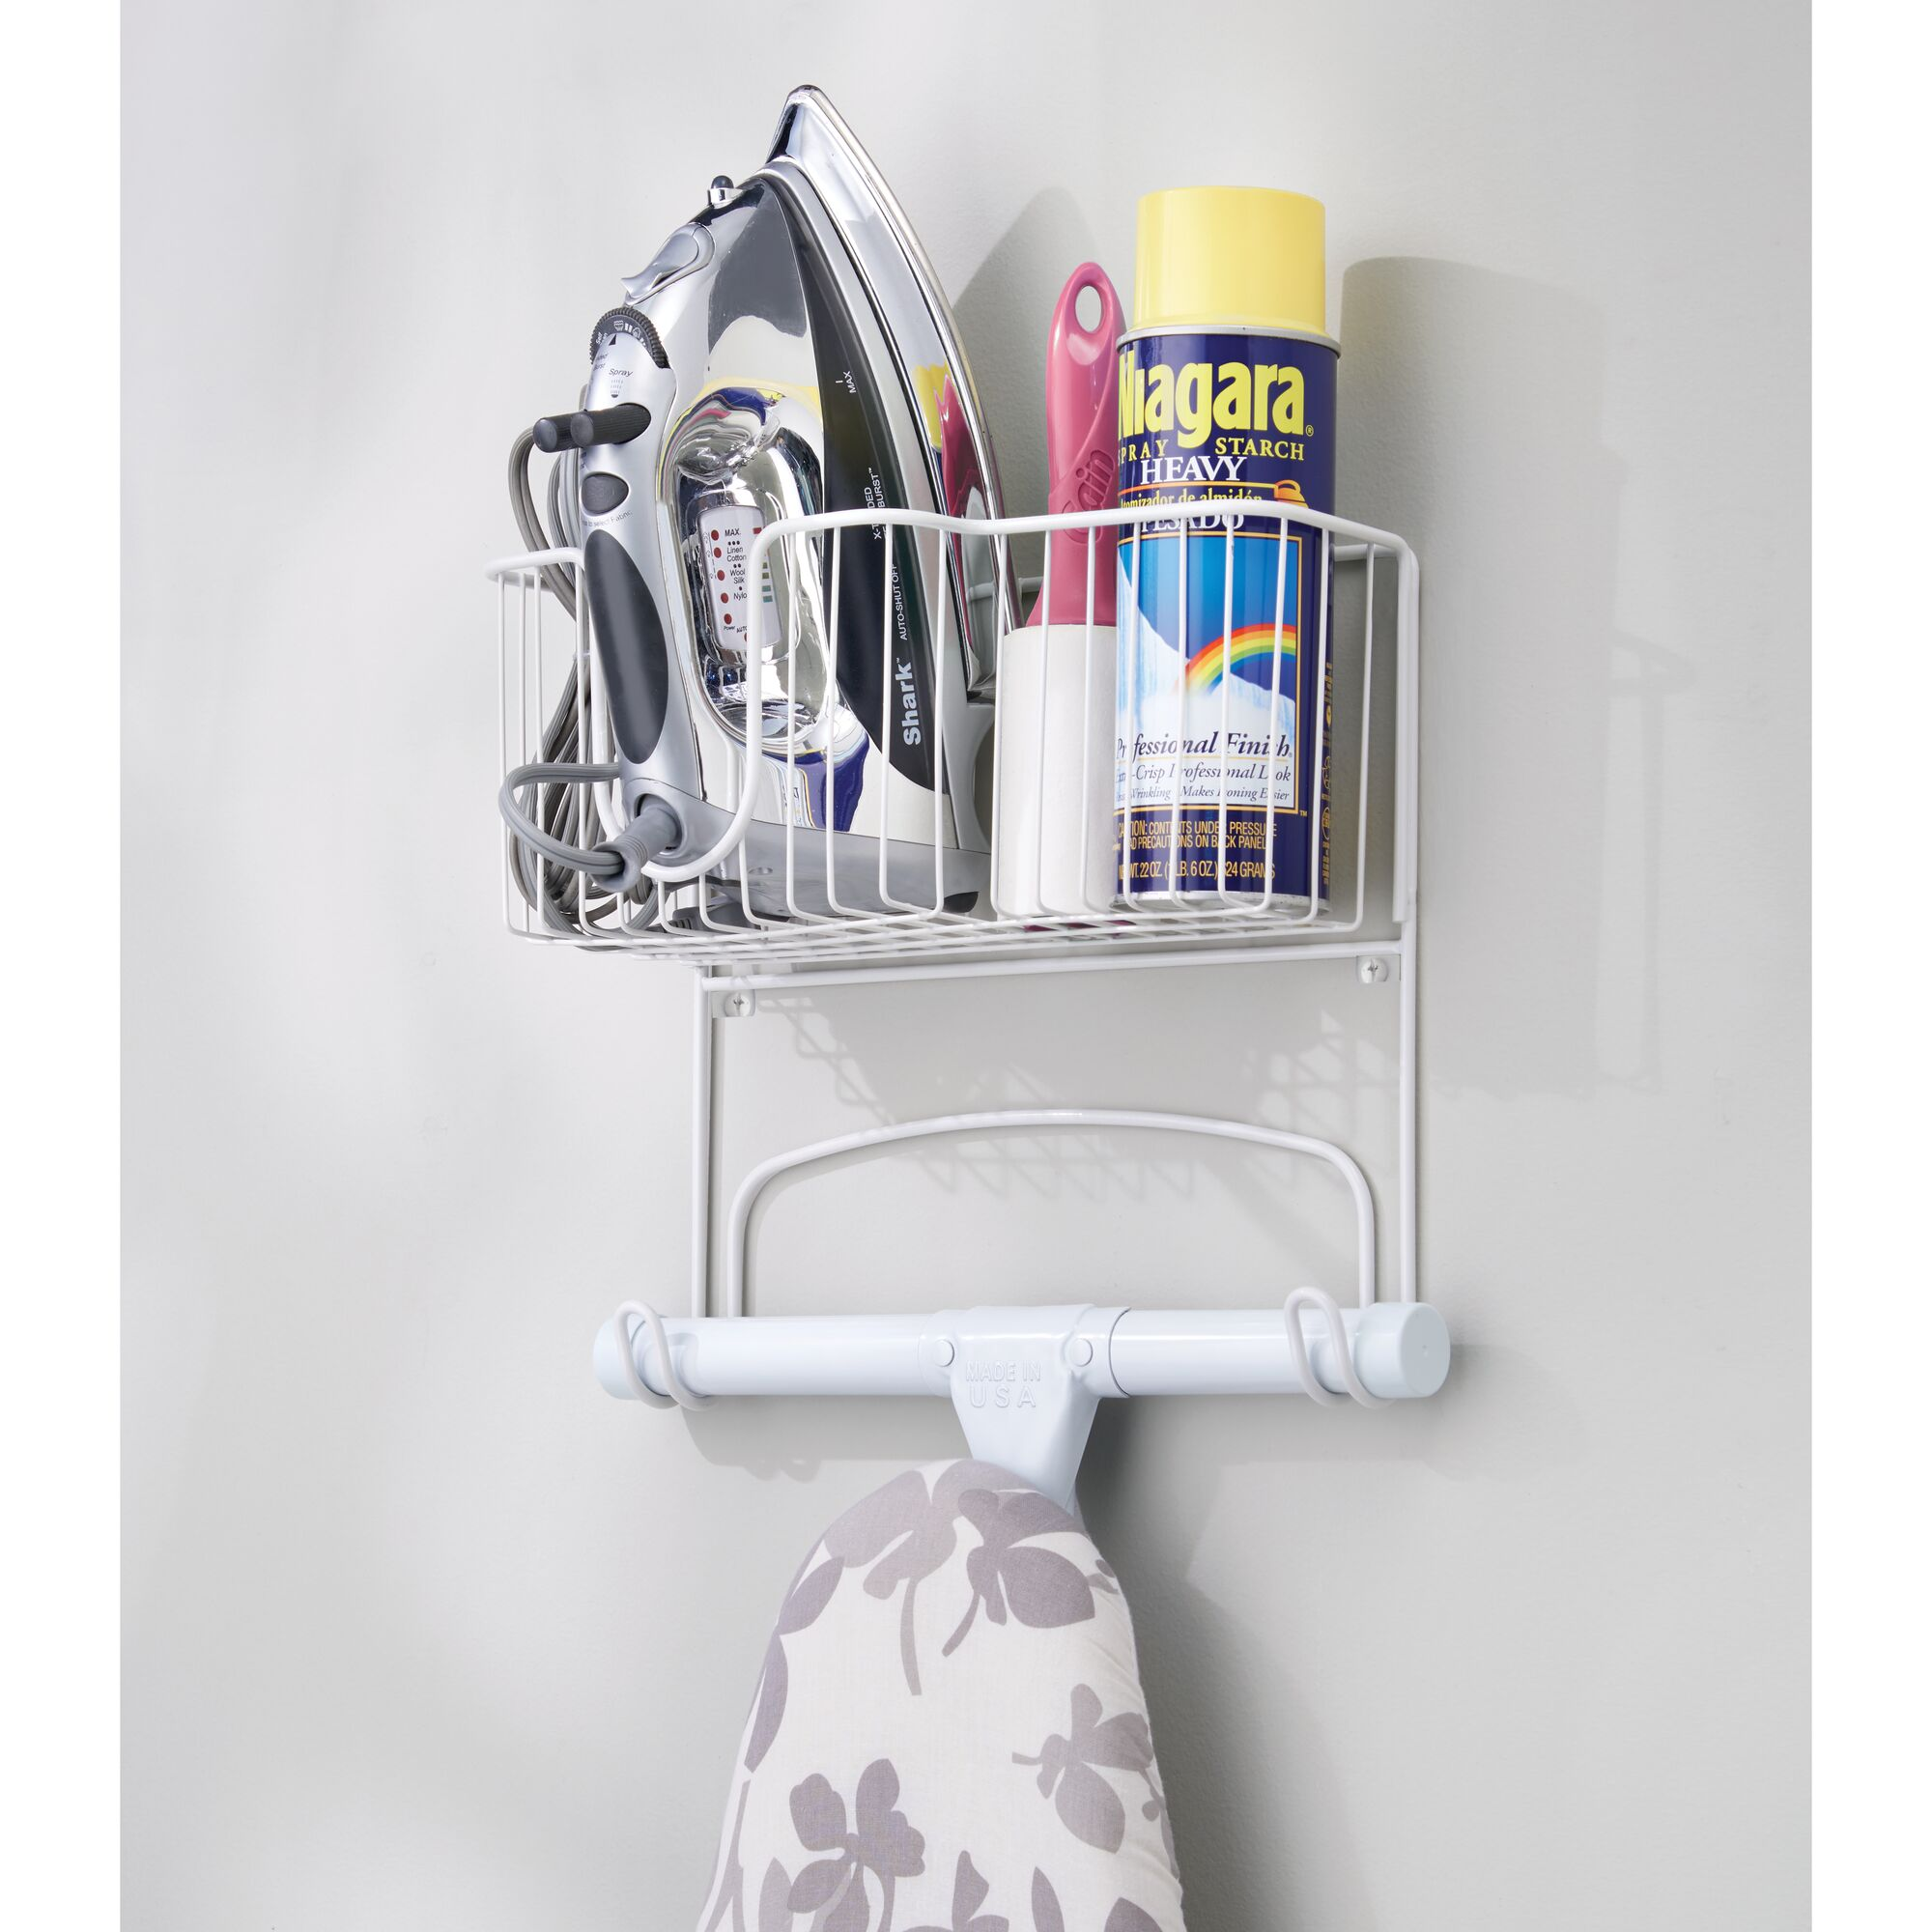 mDesign-Wall-Mount-Ironing-Board-Holder-Large-Storage-Basket thumbnail 56